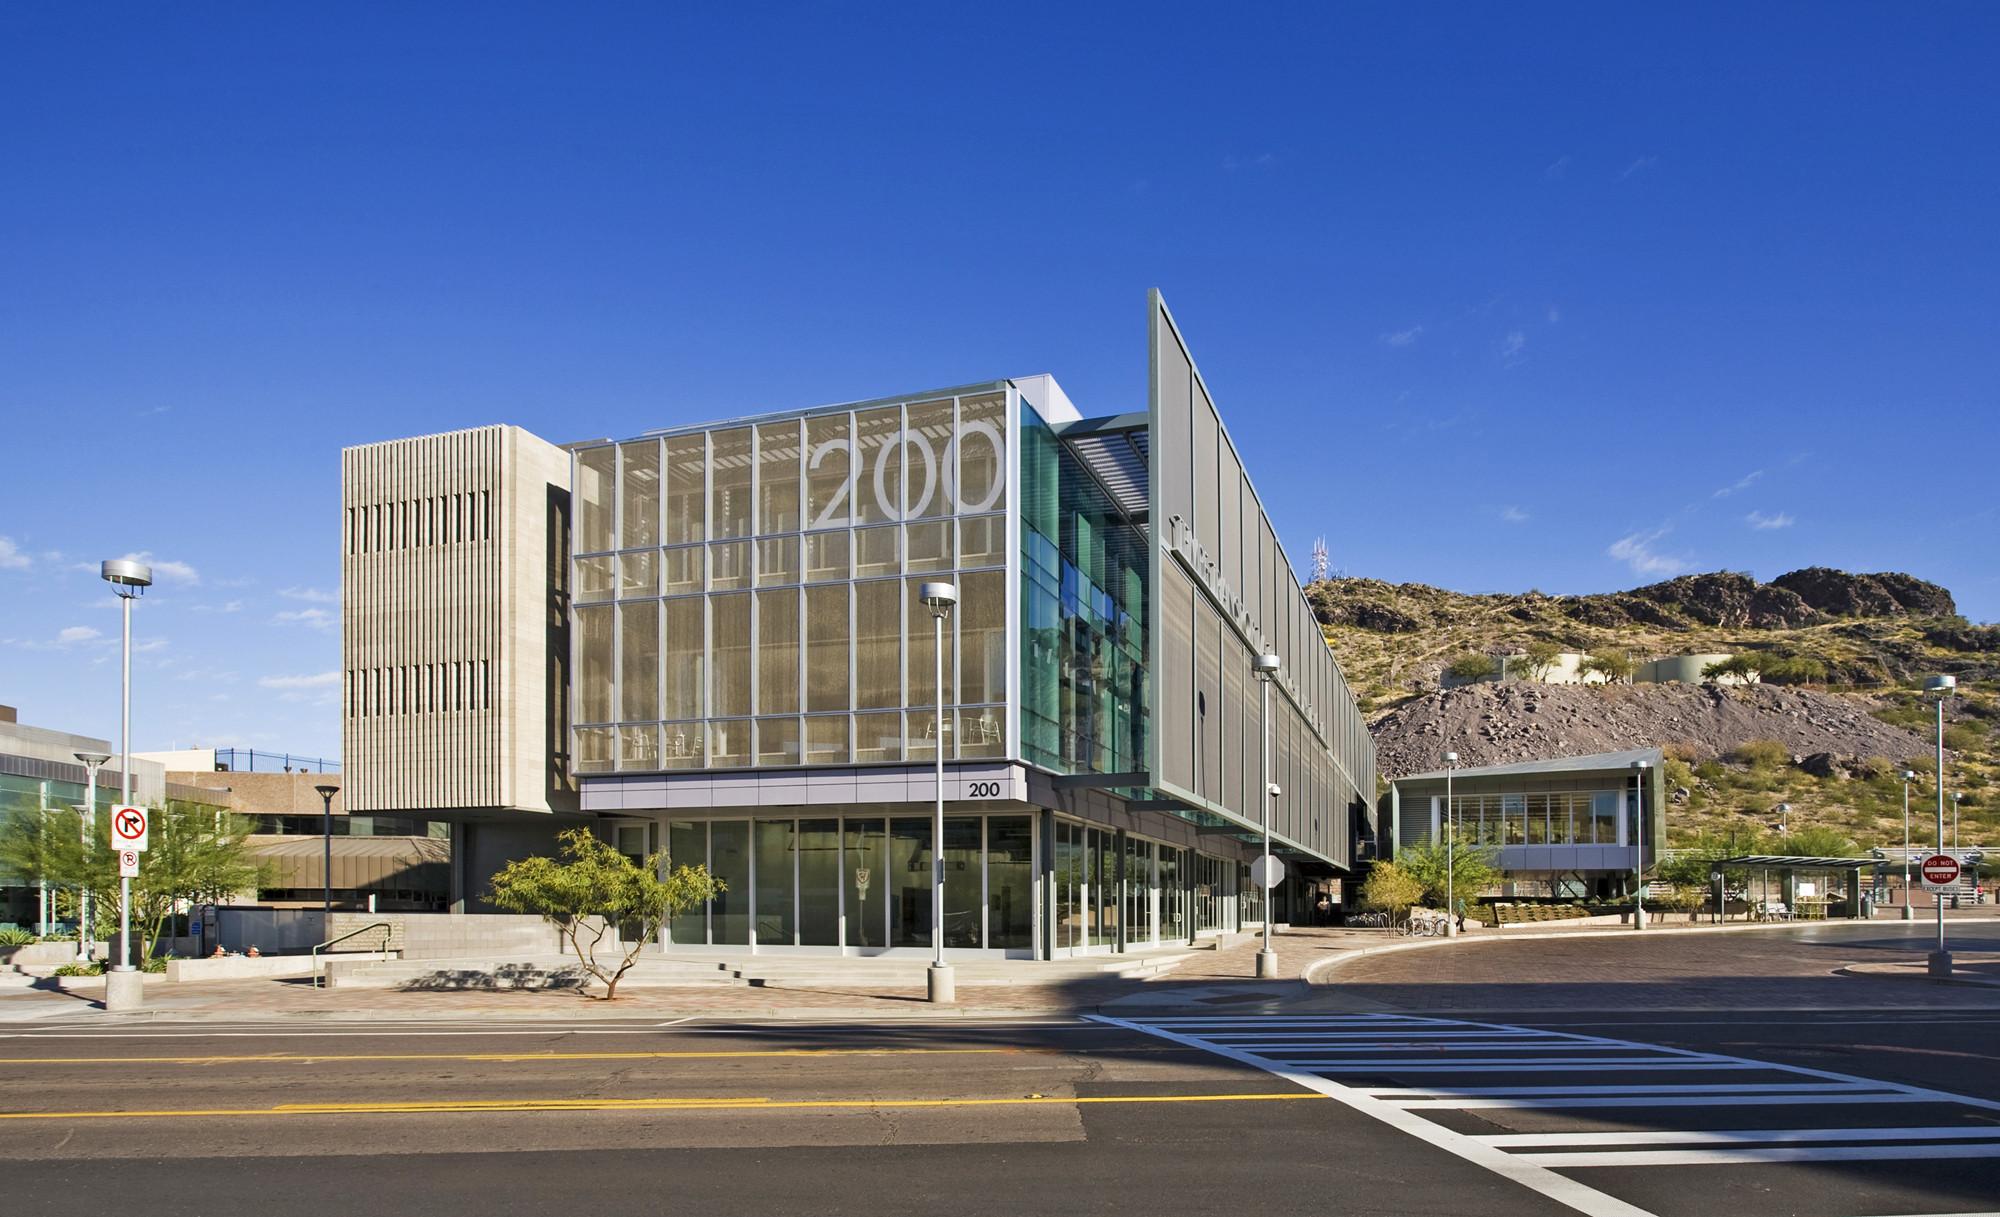 Tempe Transportation Center / Architekton, © Bill Timmerman, A.F. Payne Photographic, Architekton, Otak, Skip Neeley